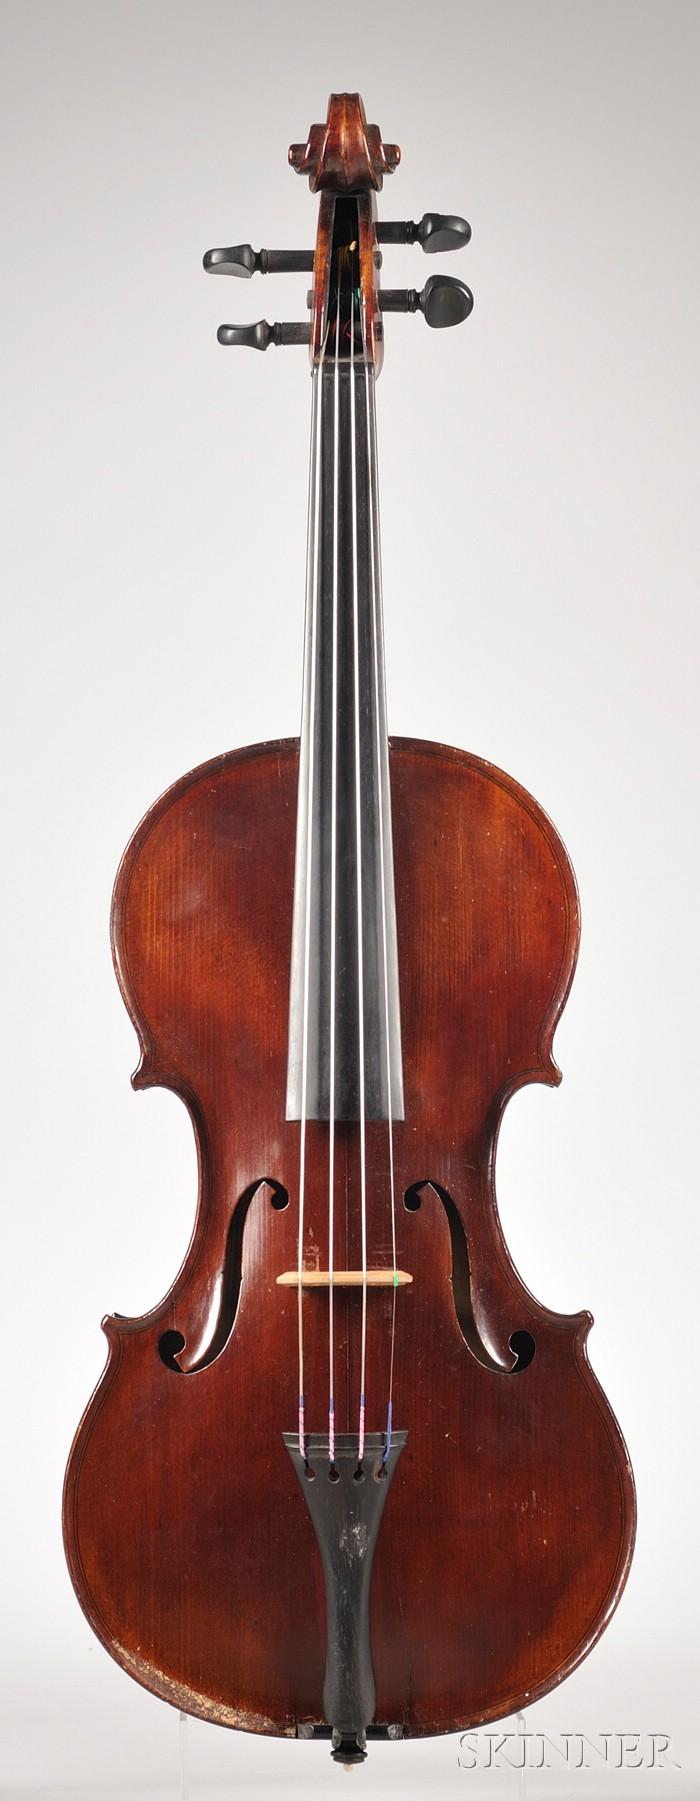 American Violin, Milton O. Wickes, Northampton, 1905